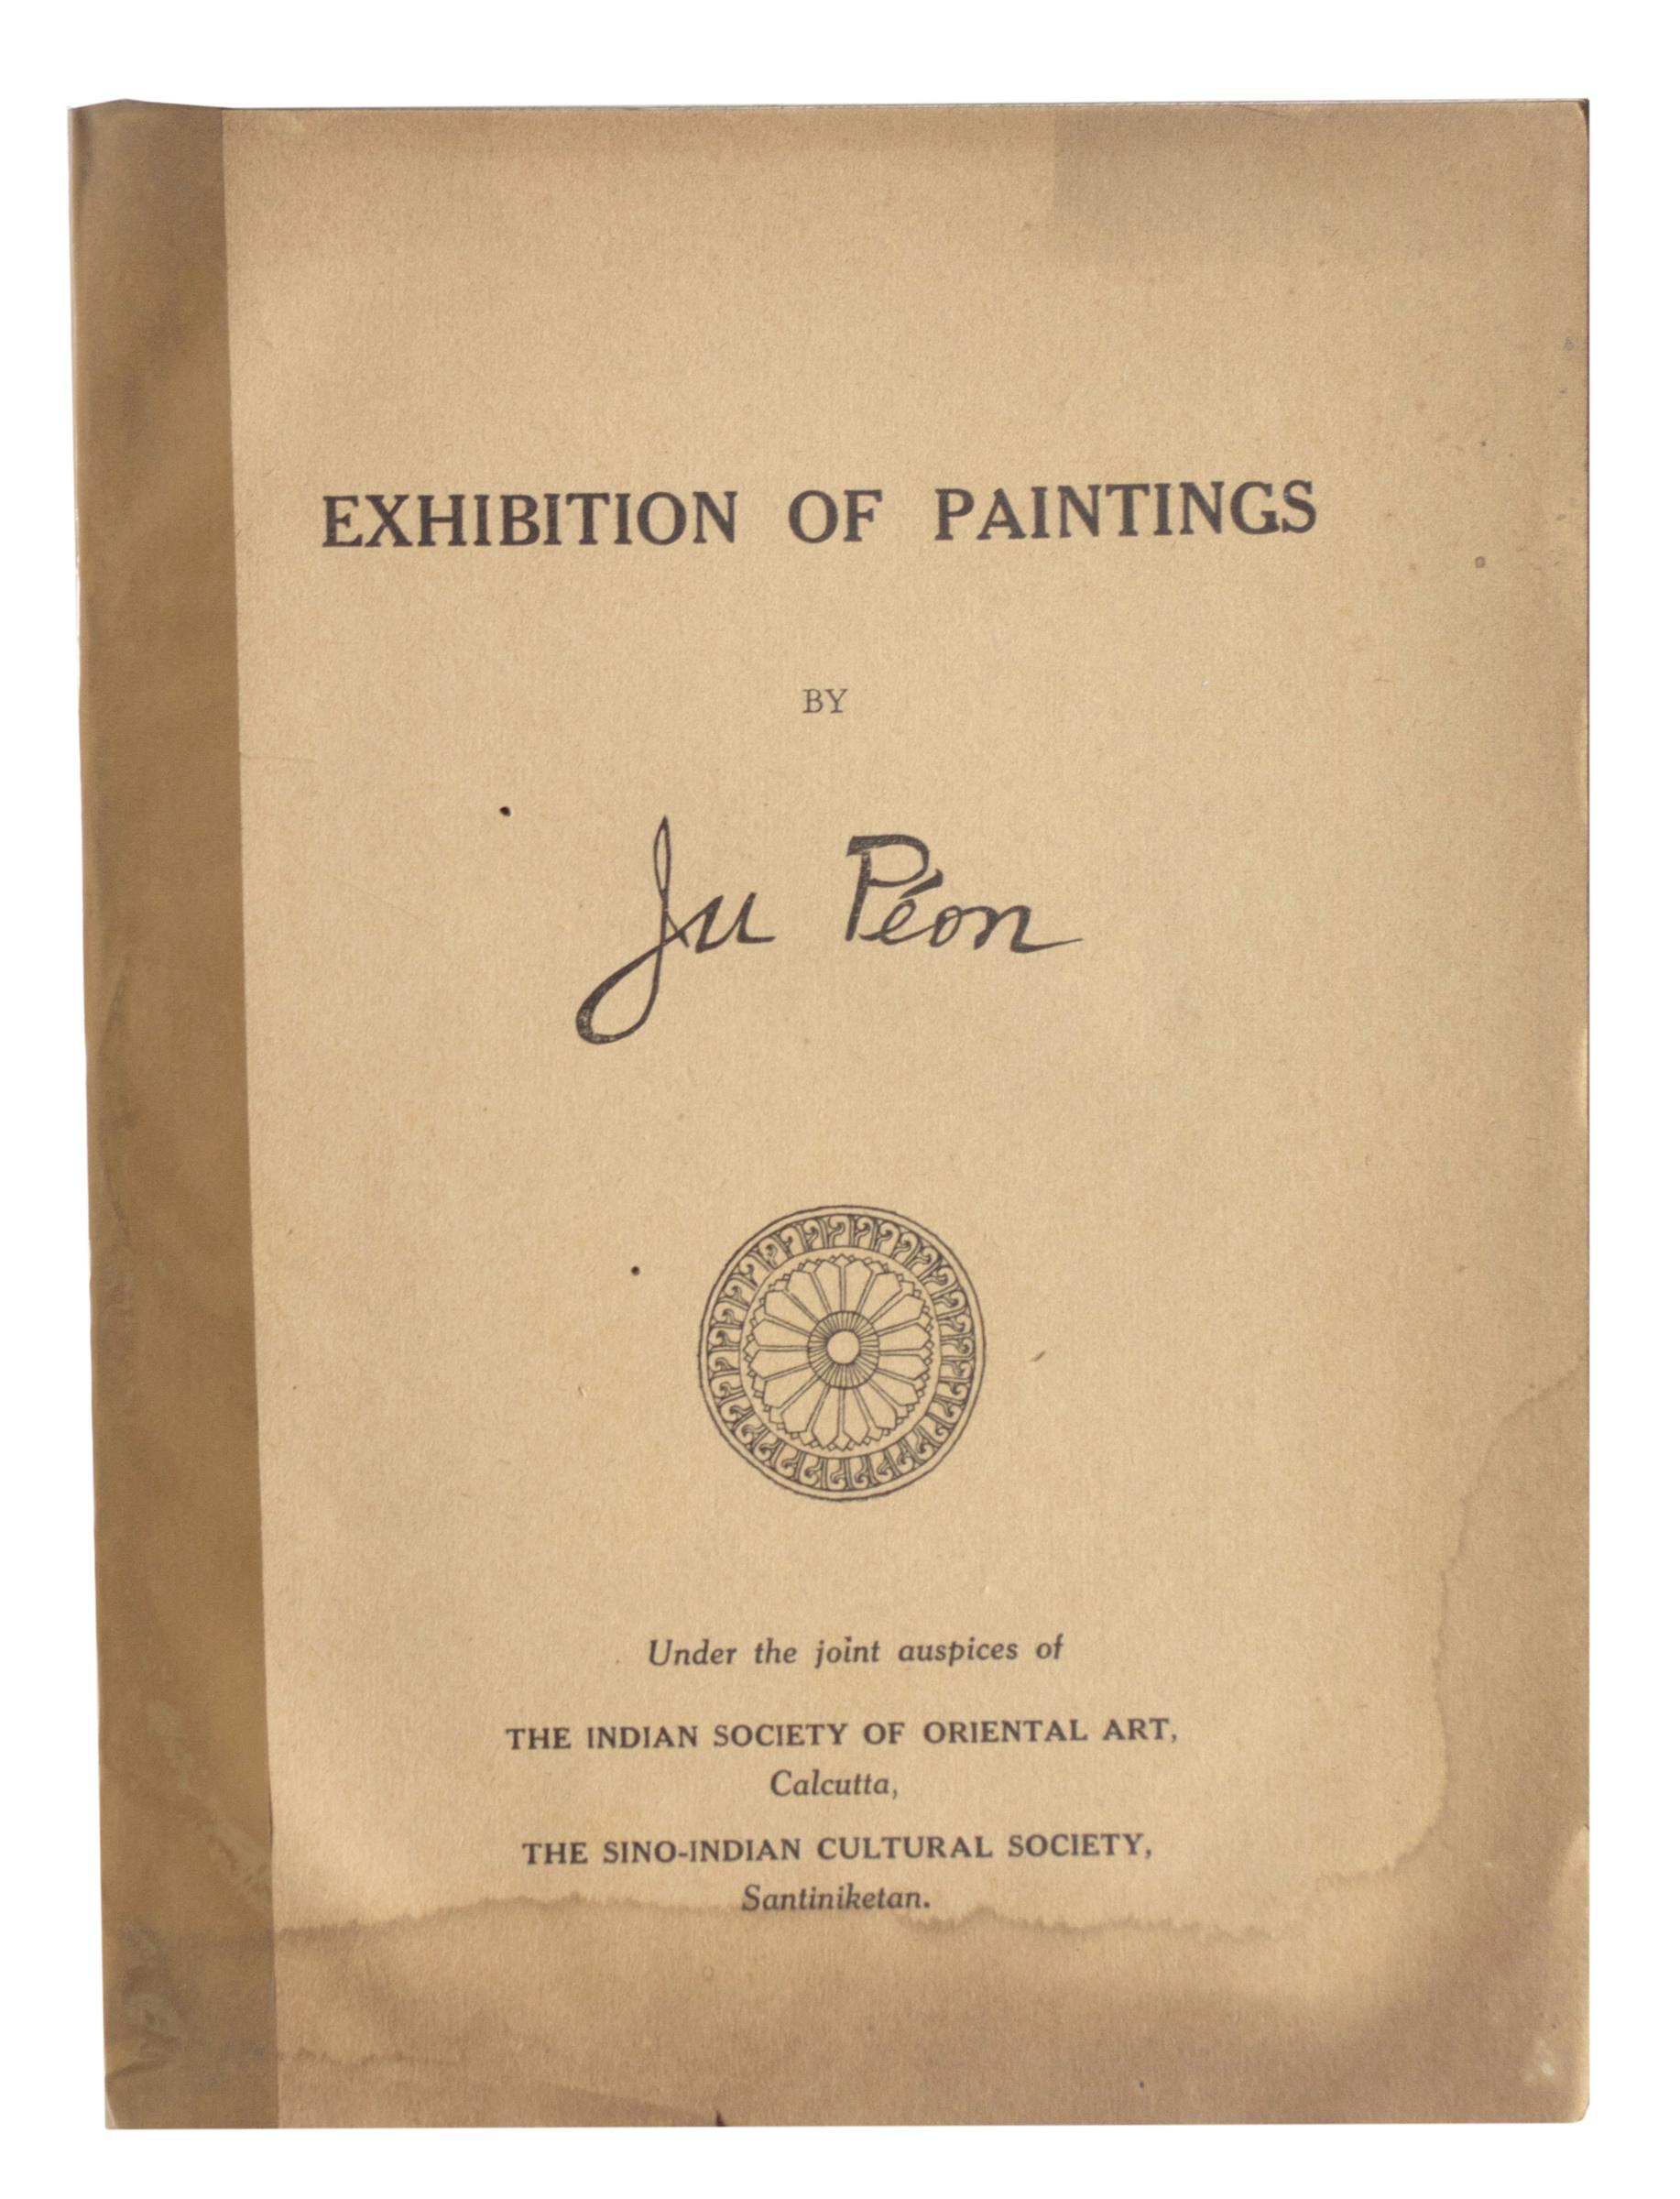 Ju Peon Exhibition catalogue 1940